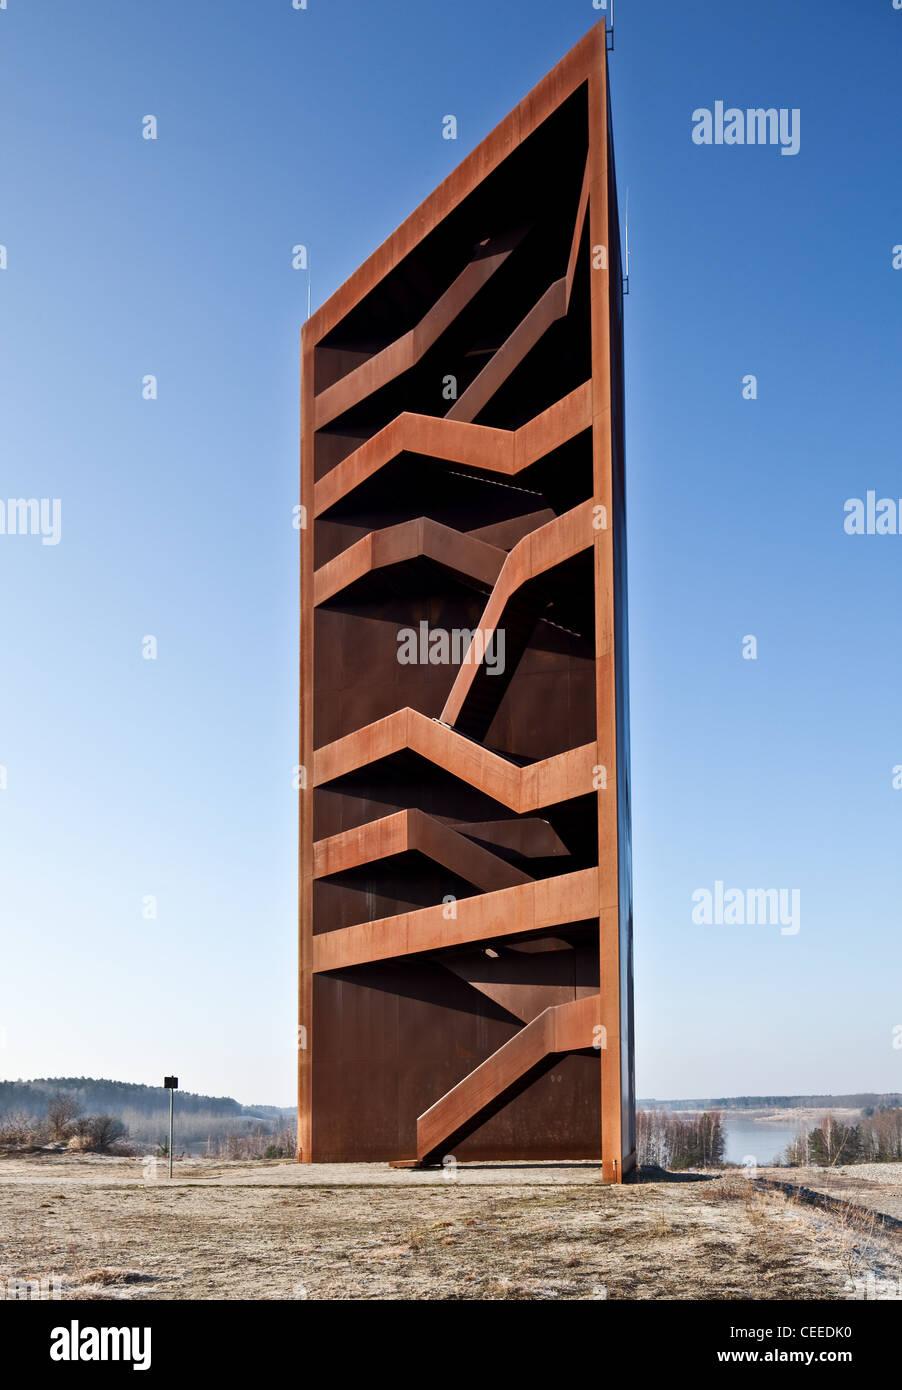 Horni Luzice Stock Photos & Horni Luzice Stock Images - Alamy